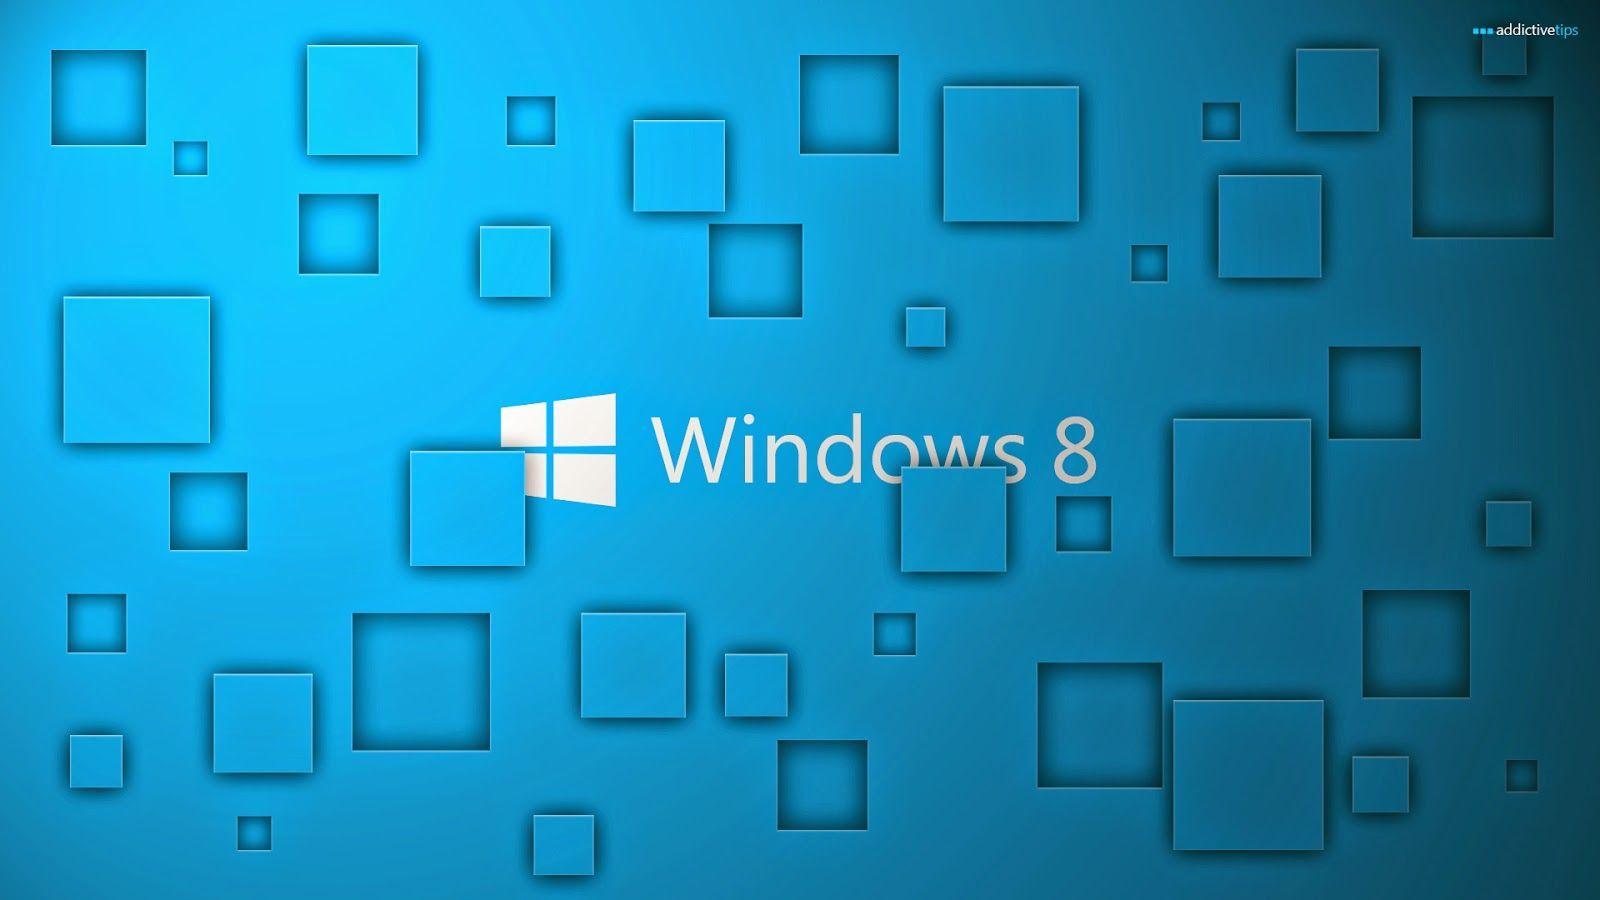 Windows Wallpaper Full Hd Design Das Gefällt Pinterest 1600